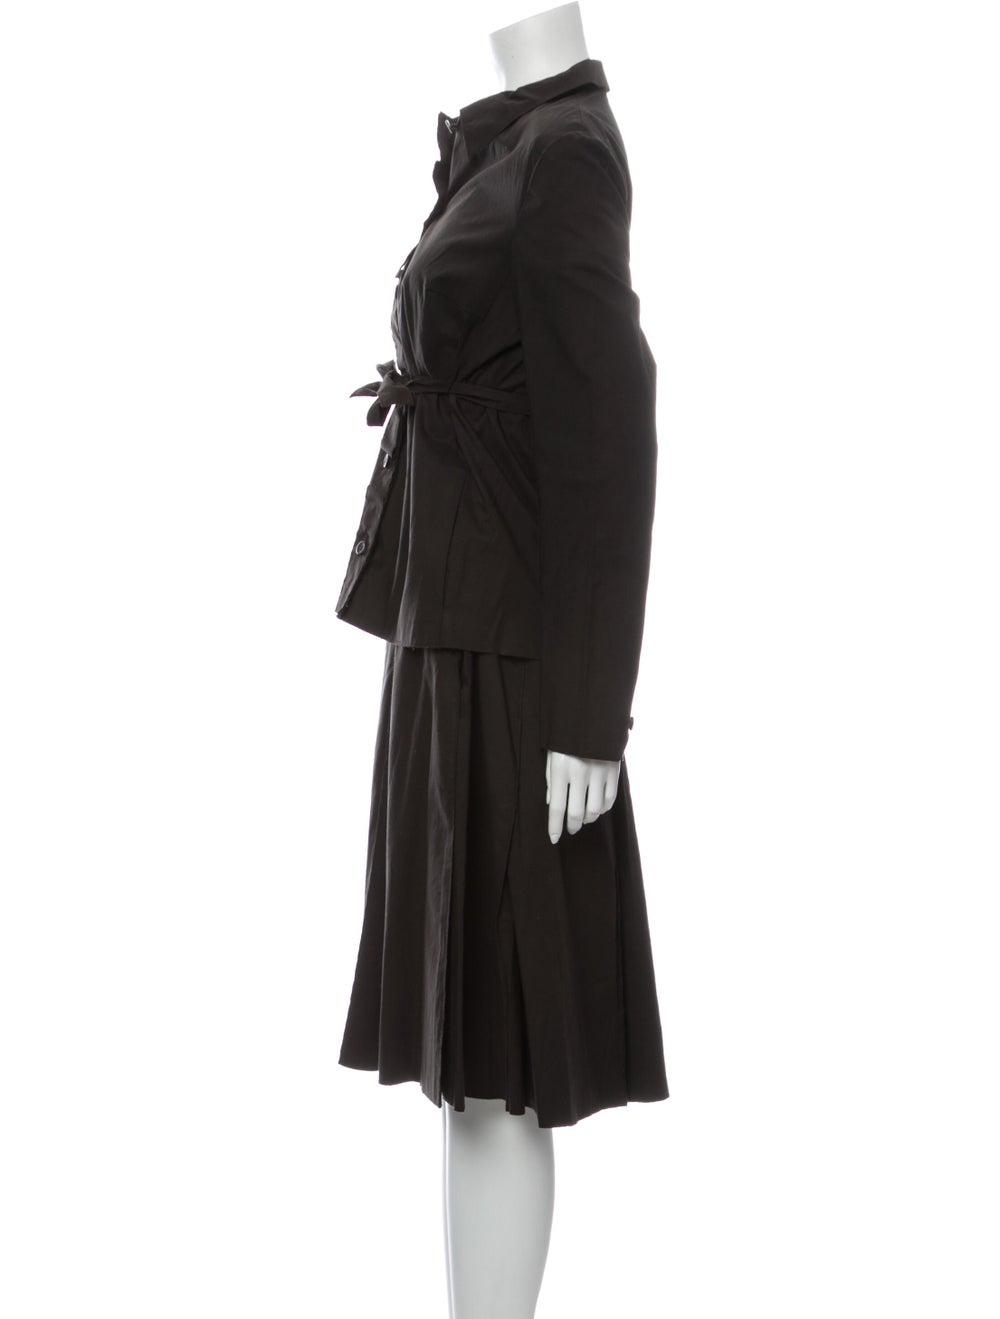 Prada Vintage 1990's Skirt Set Brown - image 2